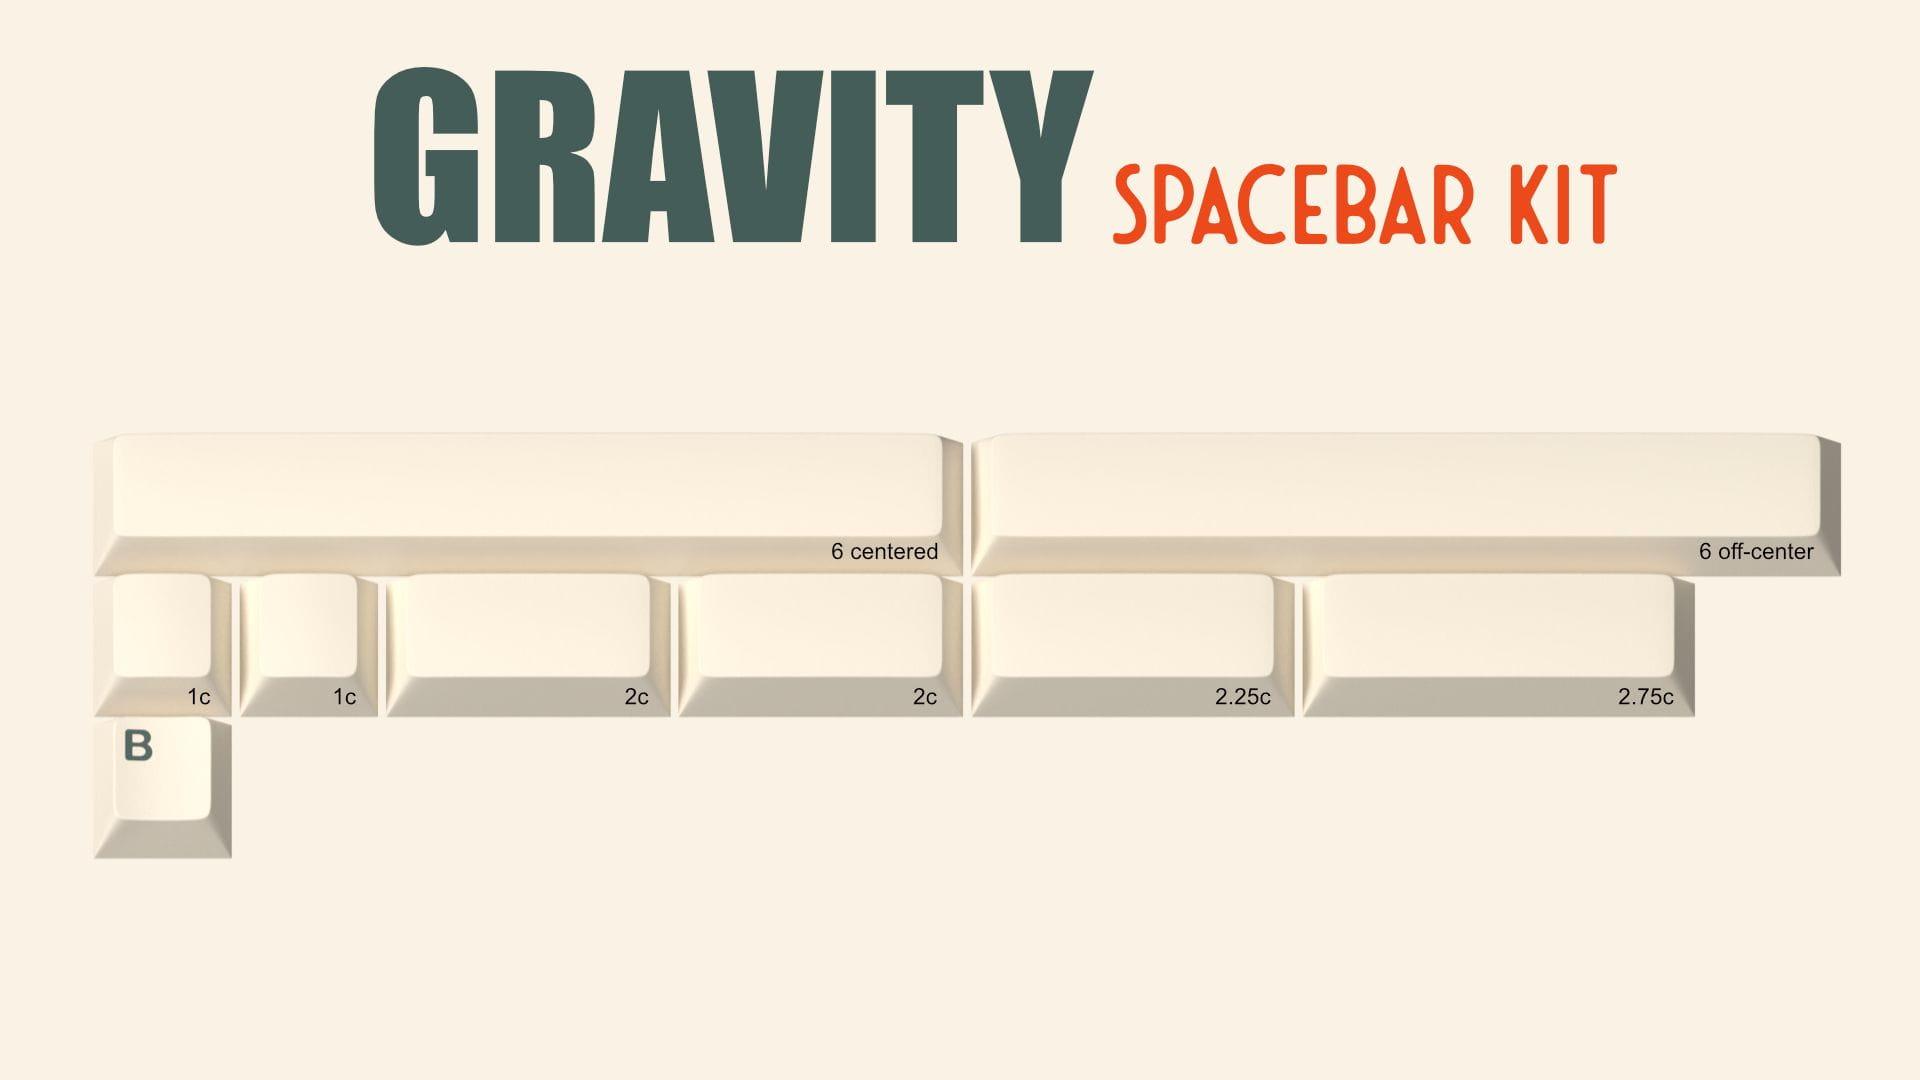 ePBT Grand Tour Gravity